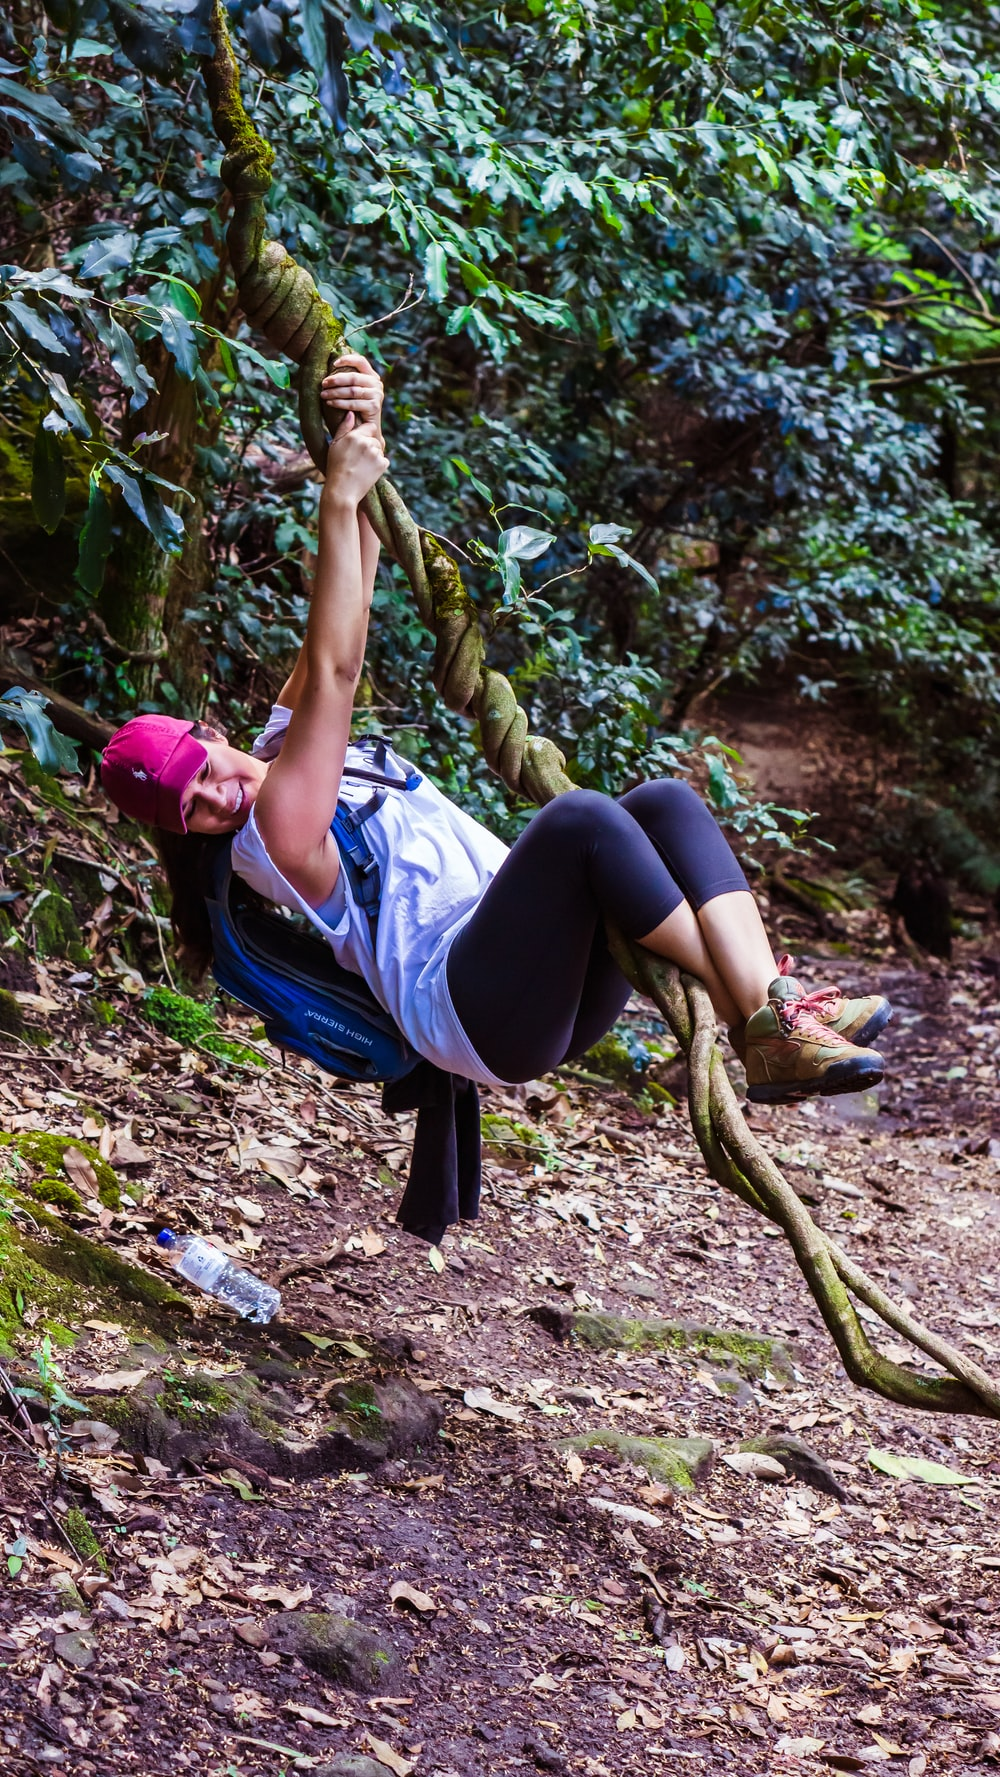 woman swinging on tree branch